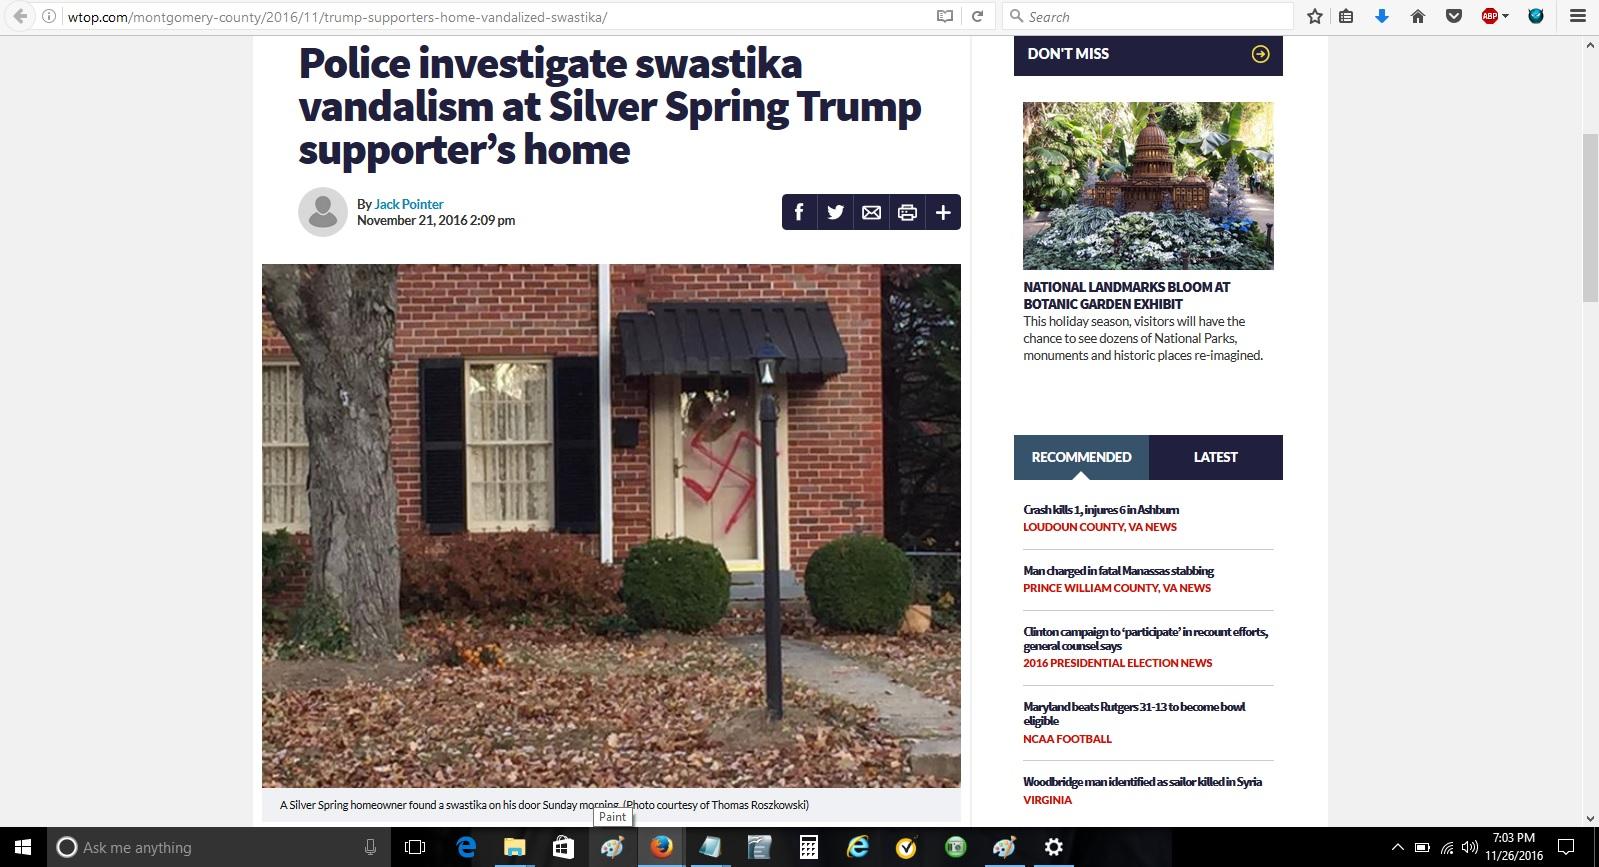 21nov-swastika-on-dc-trump-supp-home